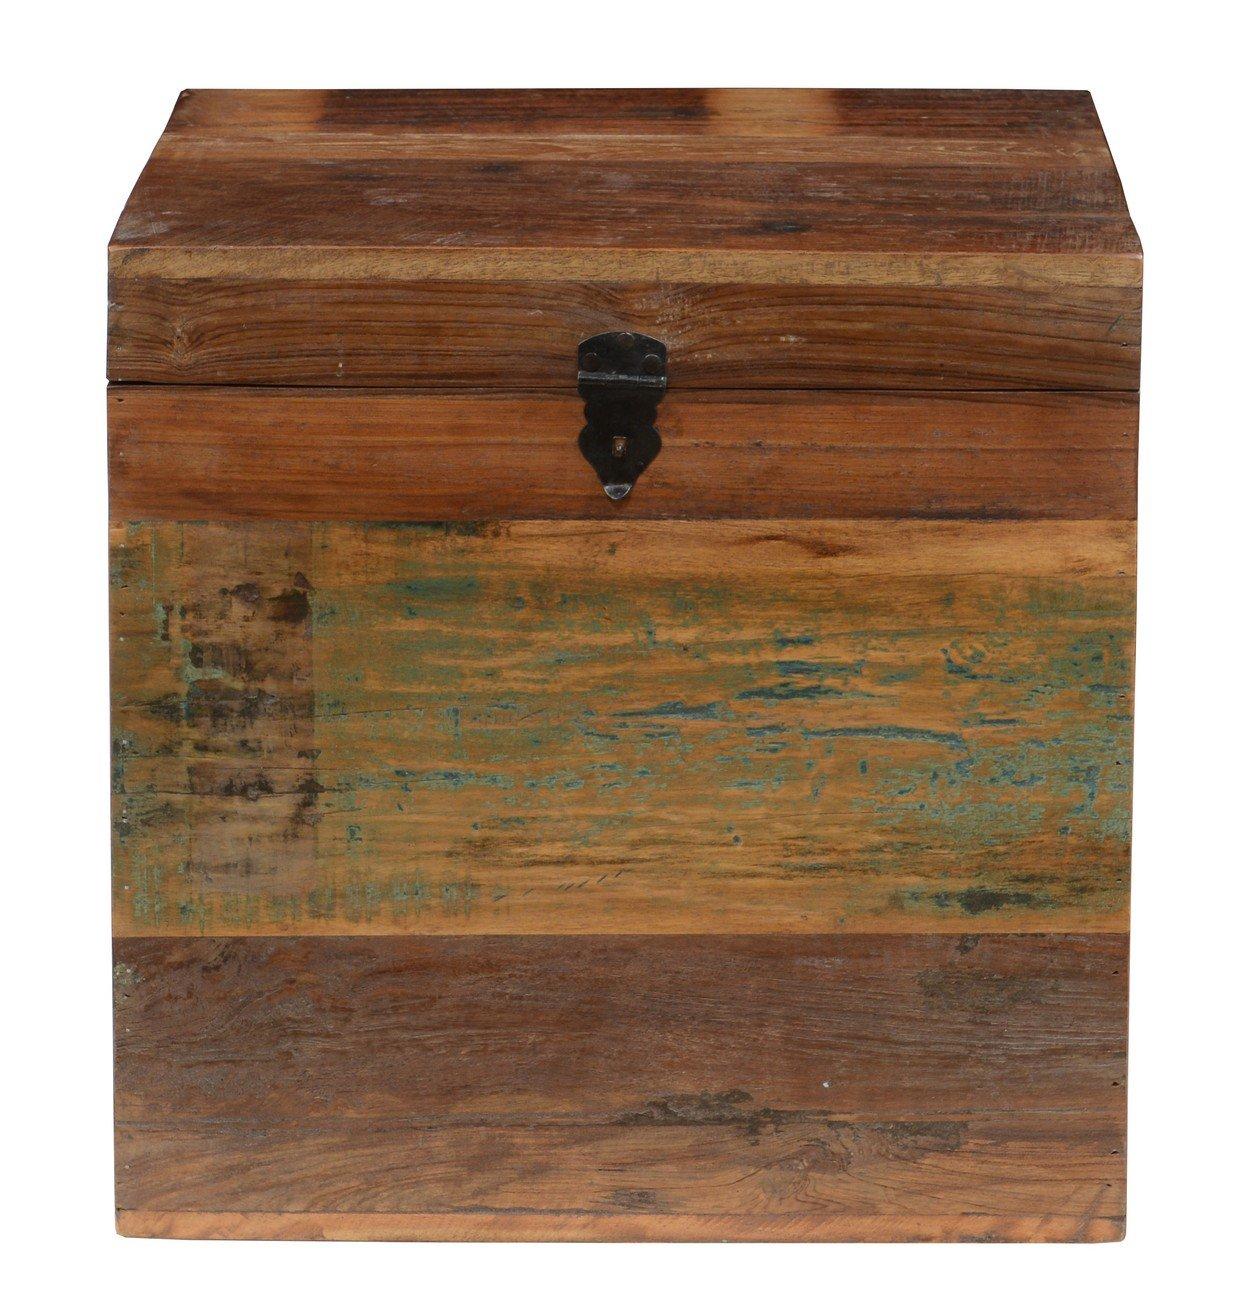 Kosas Home A59946171Z Bali Small Recycled Wood Box, Mahogany Wood Finish with Bronze Hardware